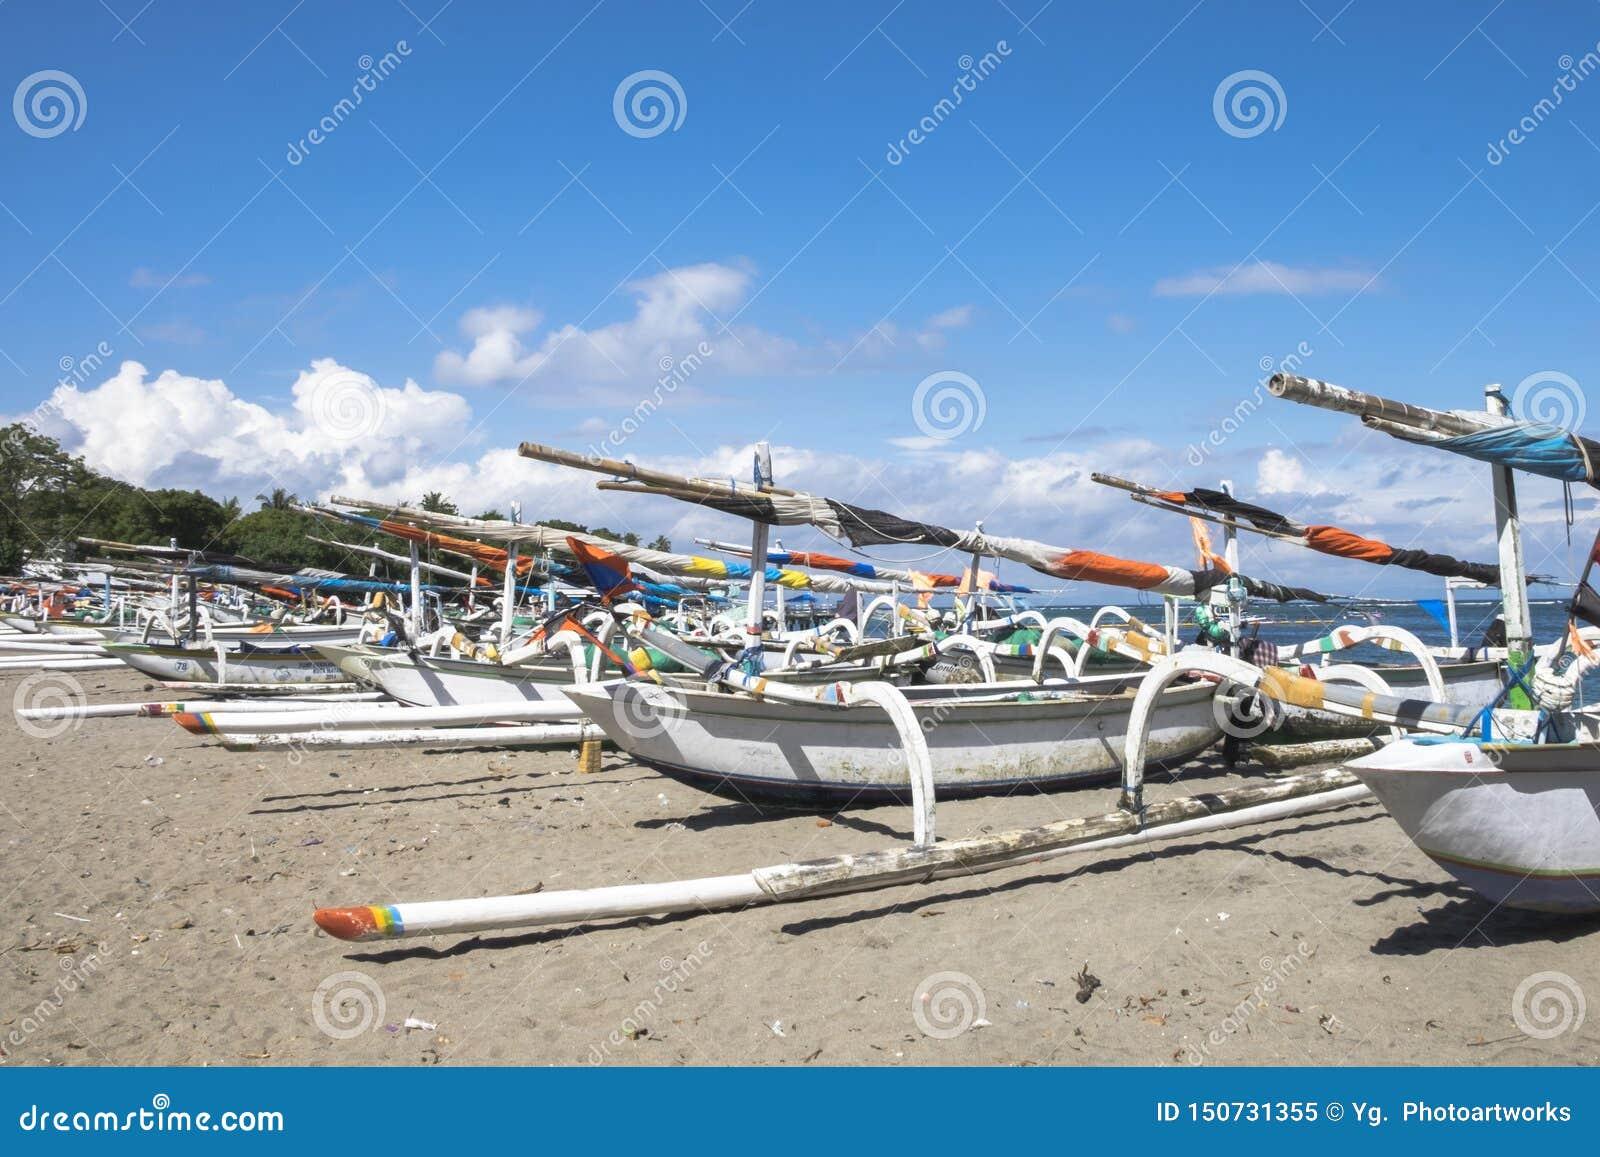 Traditional Fishing Boats Parking on the Senggigi Beach